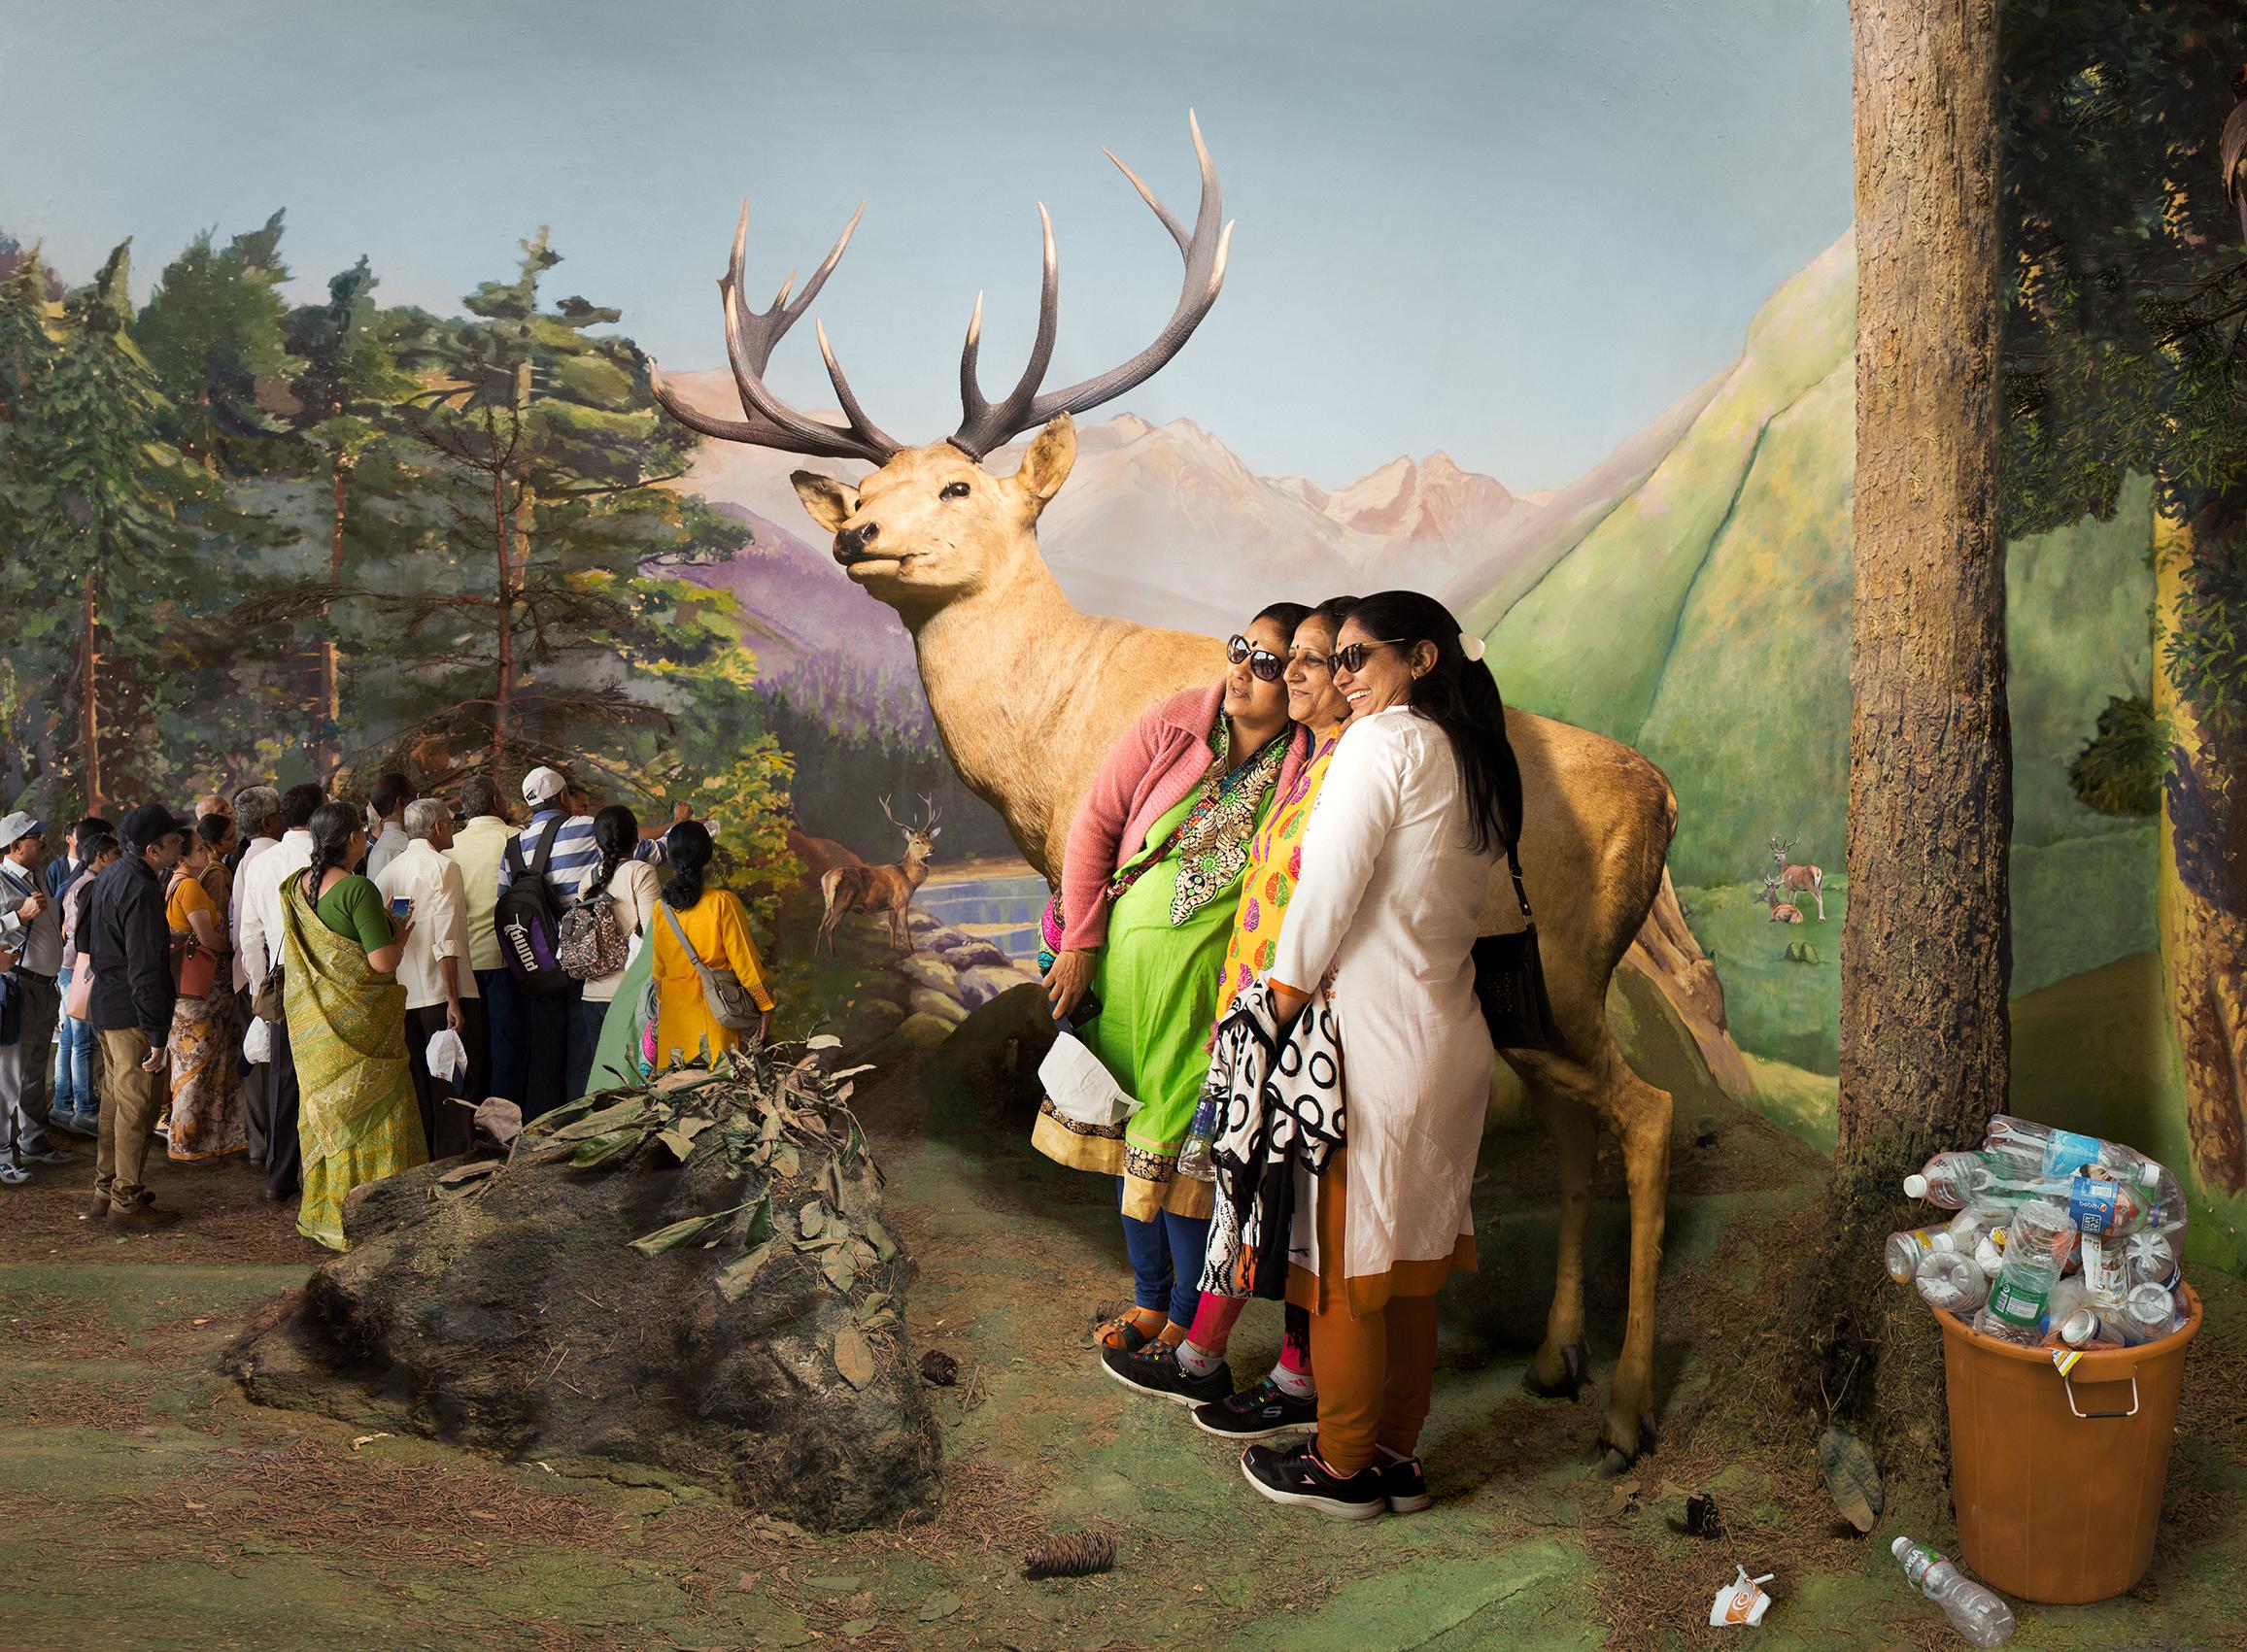 Anne Zahalka, Krazy Kashmiris in Stagland ,2018, pigment ink-jet print on canvas, 100 x 136 cm